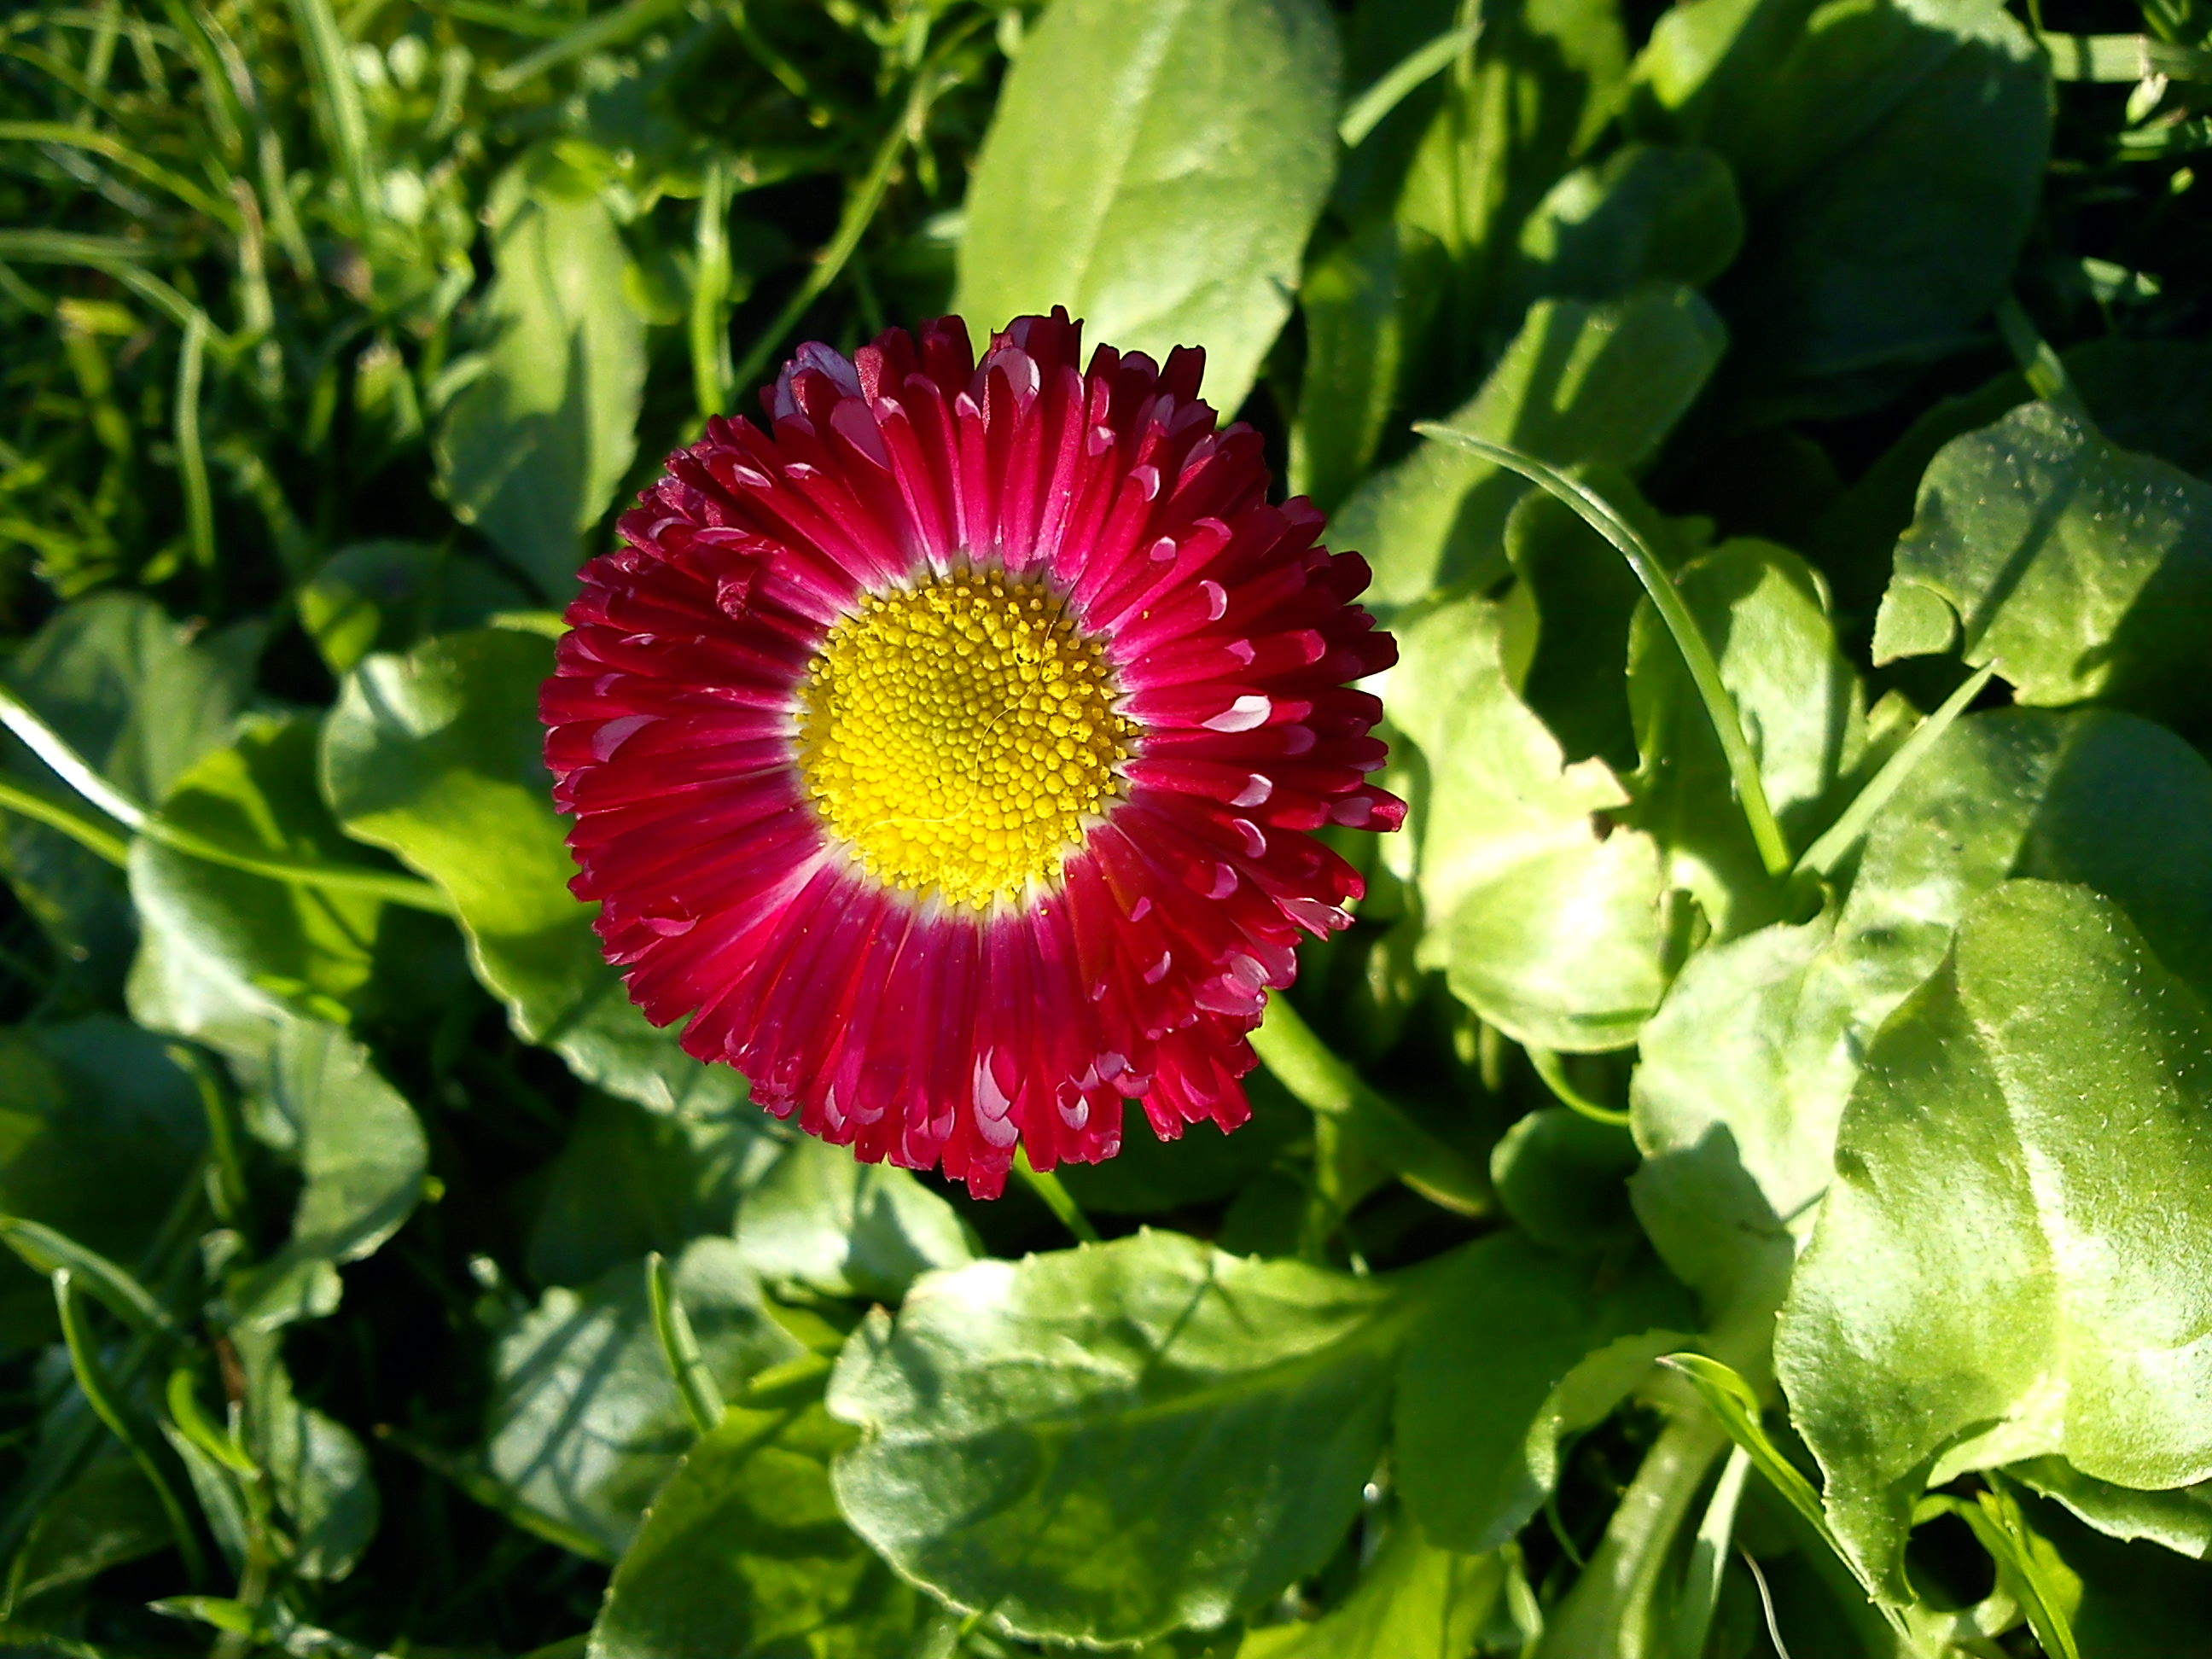 Pink Flower In November By Crissandy On Deviantart